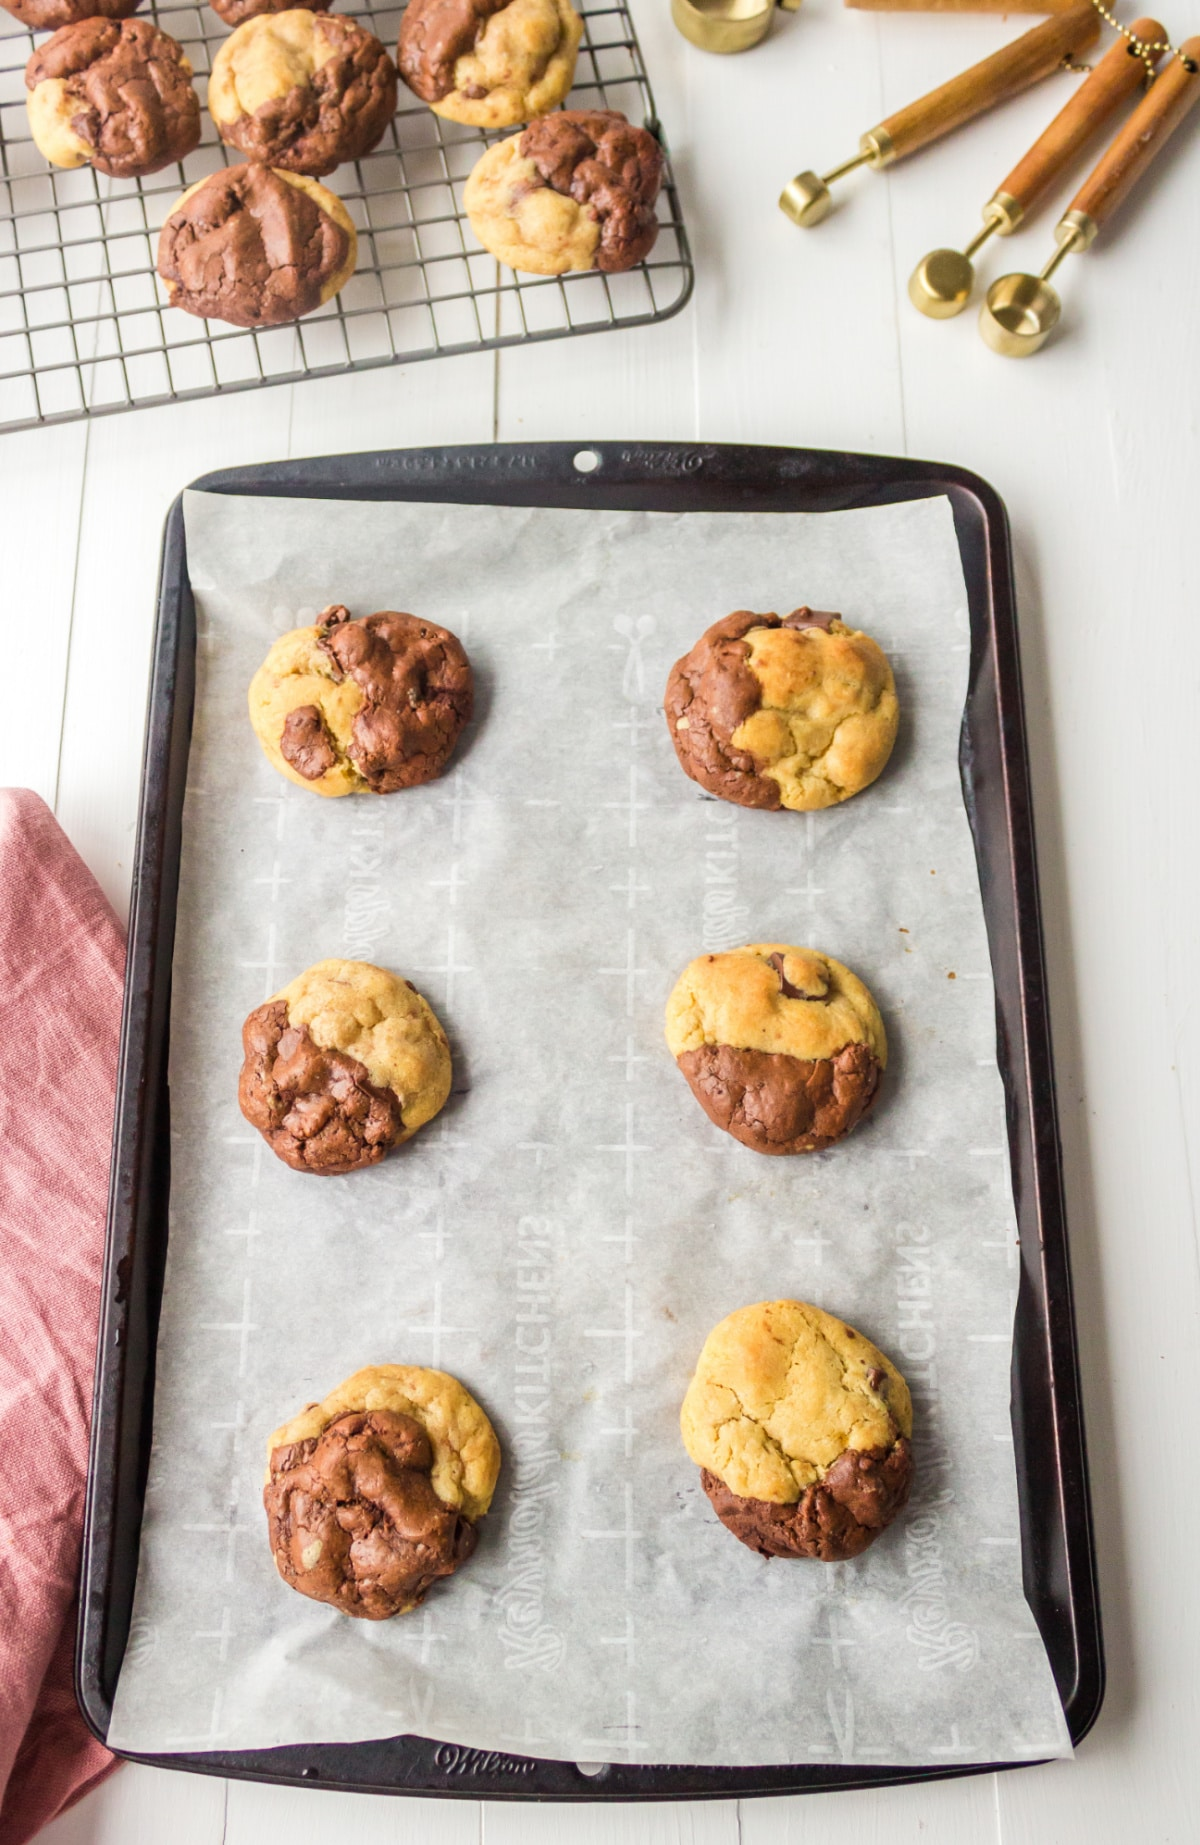 Baked brookies on a baking sheet